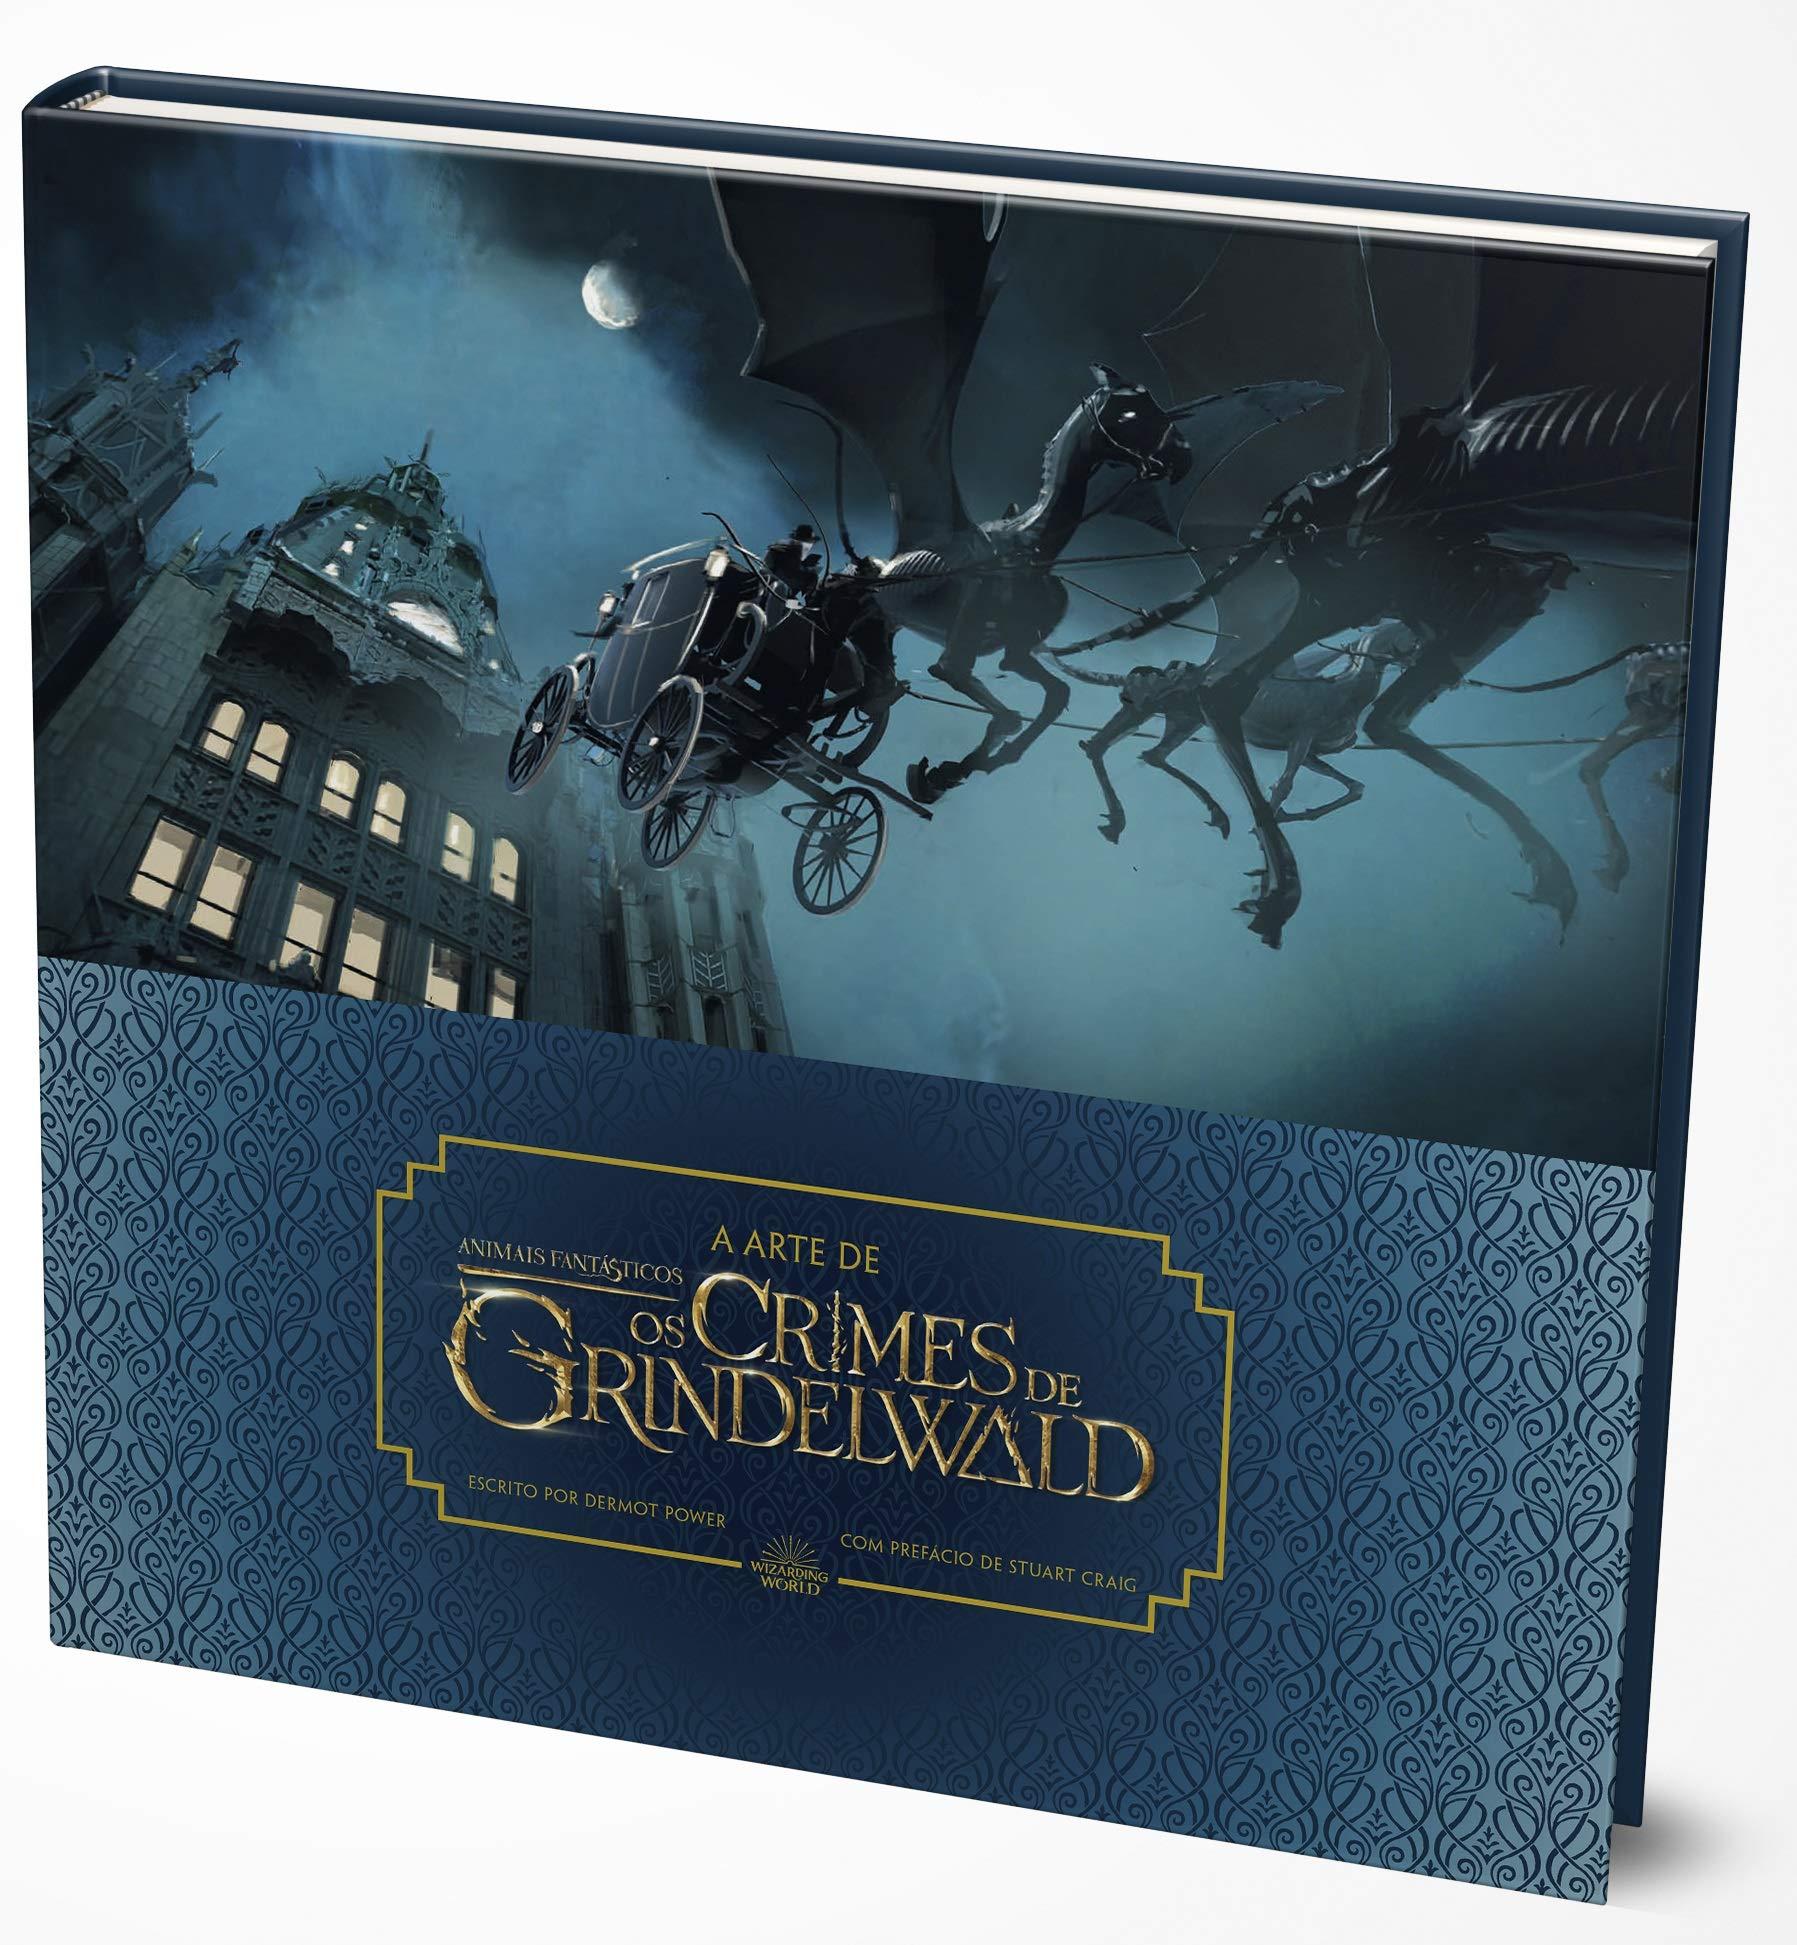 A Arte de Animais Fantásticos. Os Crimes de Grindelwald